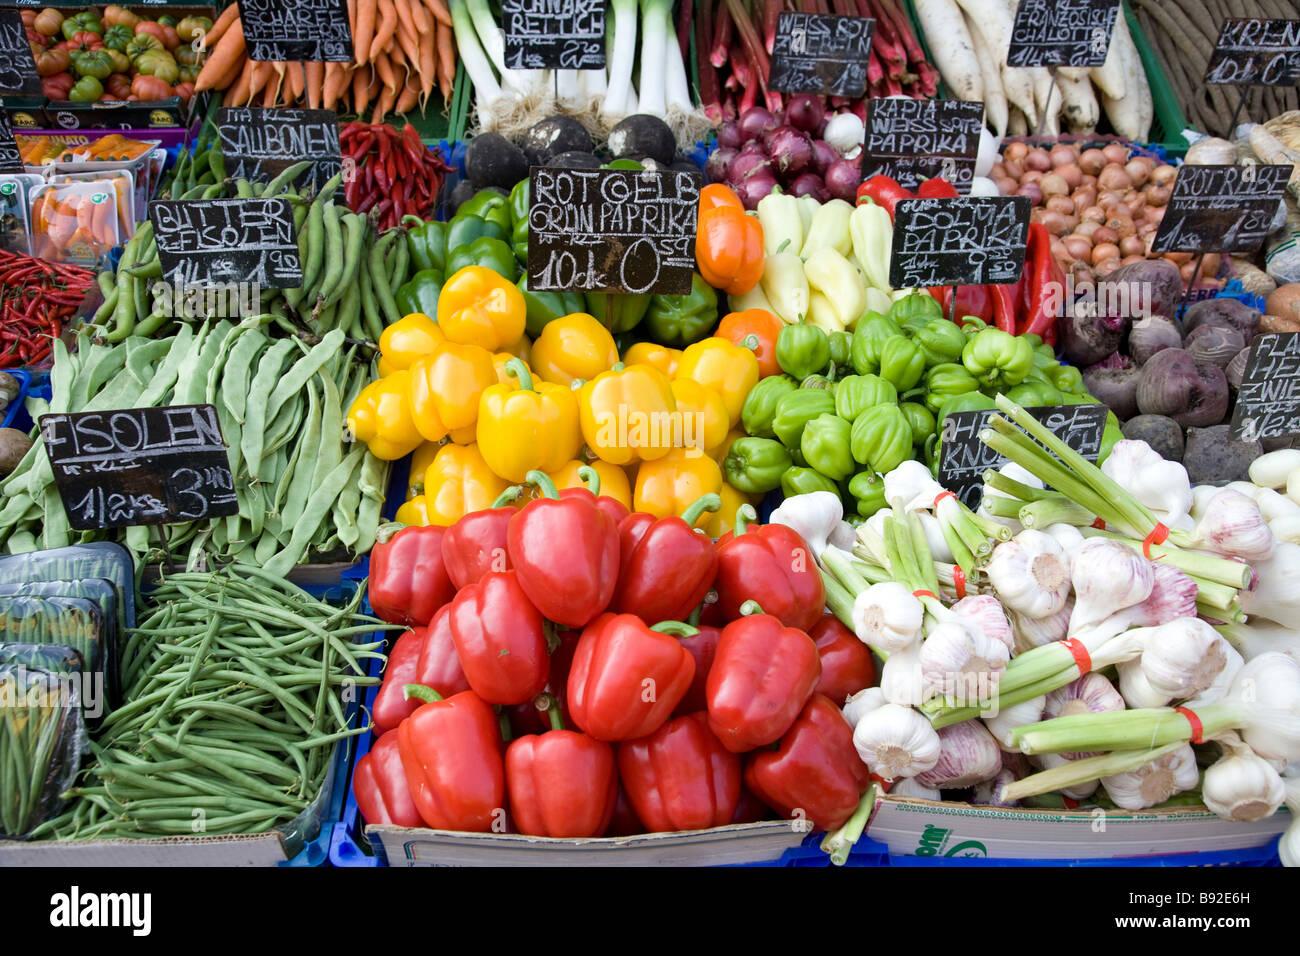 Vegetables displayed on stall at the popular Naschmarkt open air market in Vienna Austria - Stock Image